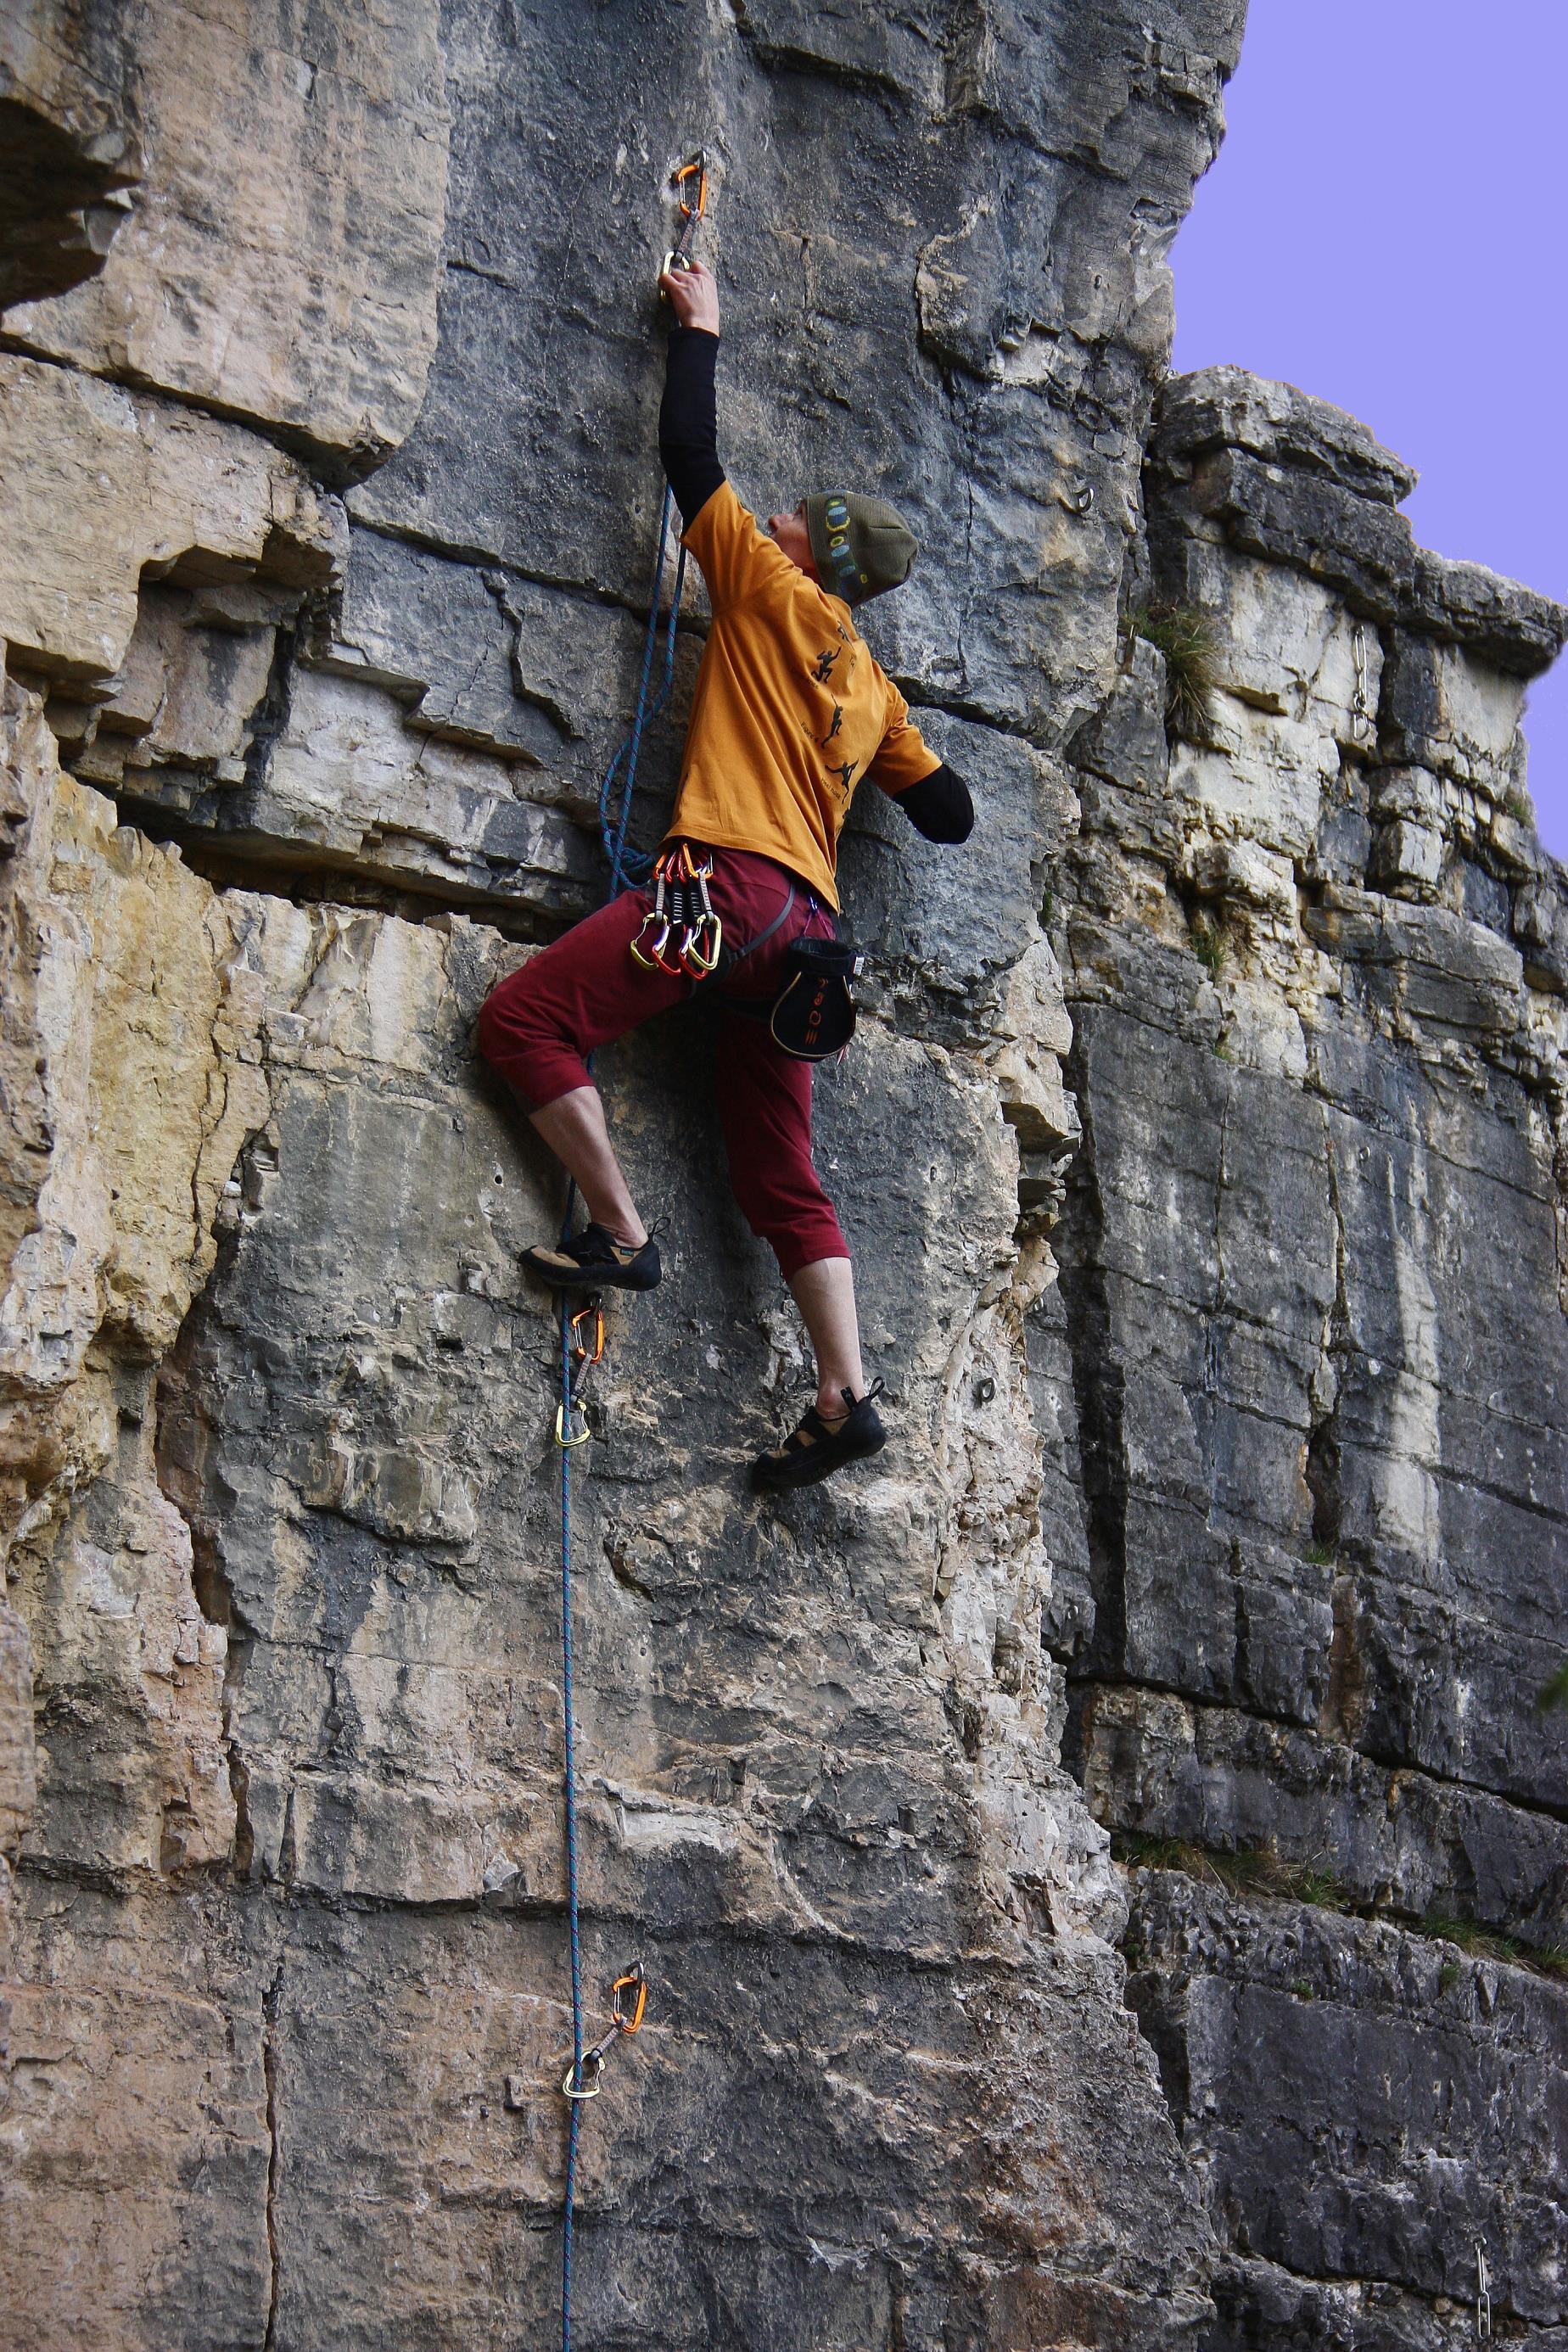 Climbing Wall Trodena/Truden, Molini/Mühlen